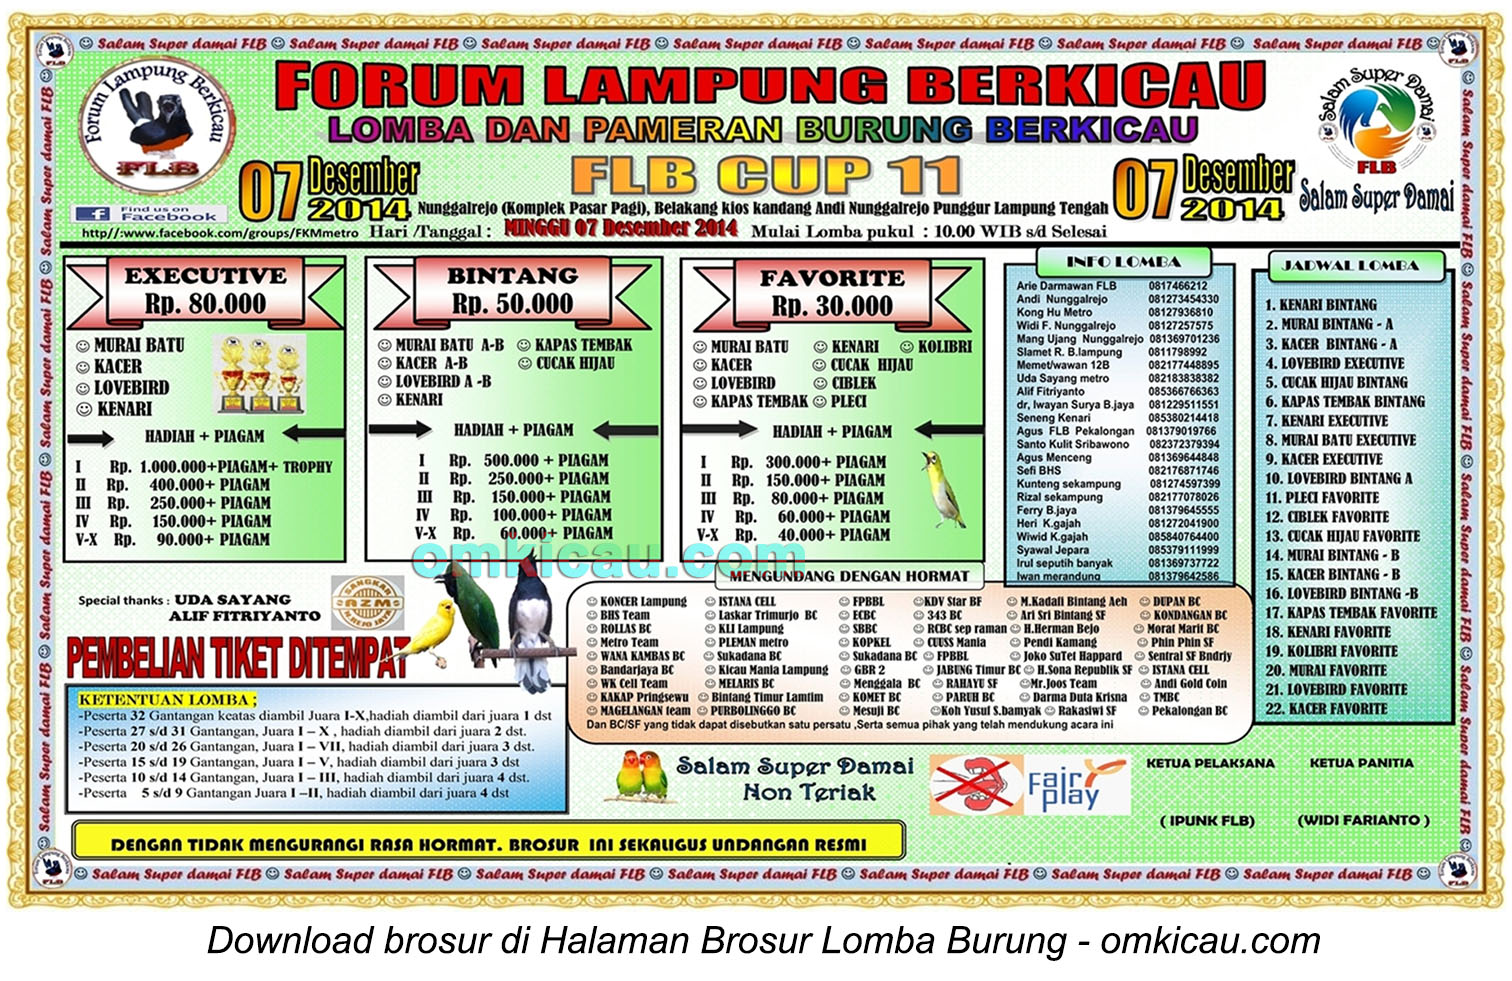 Brosur Lomba Burung Berkicau FLB Cup 11, Lampung Tengah, 7 Desember 2014